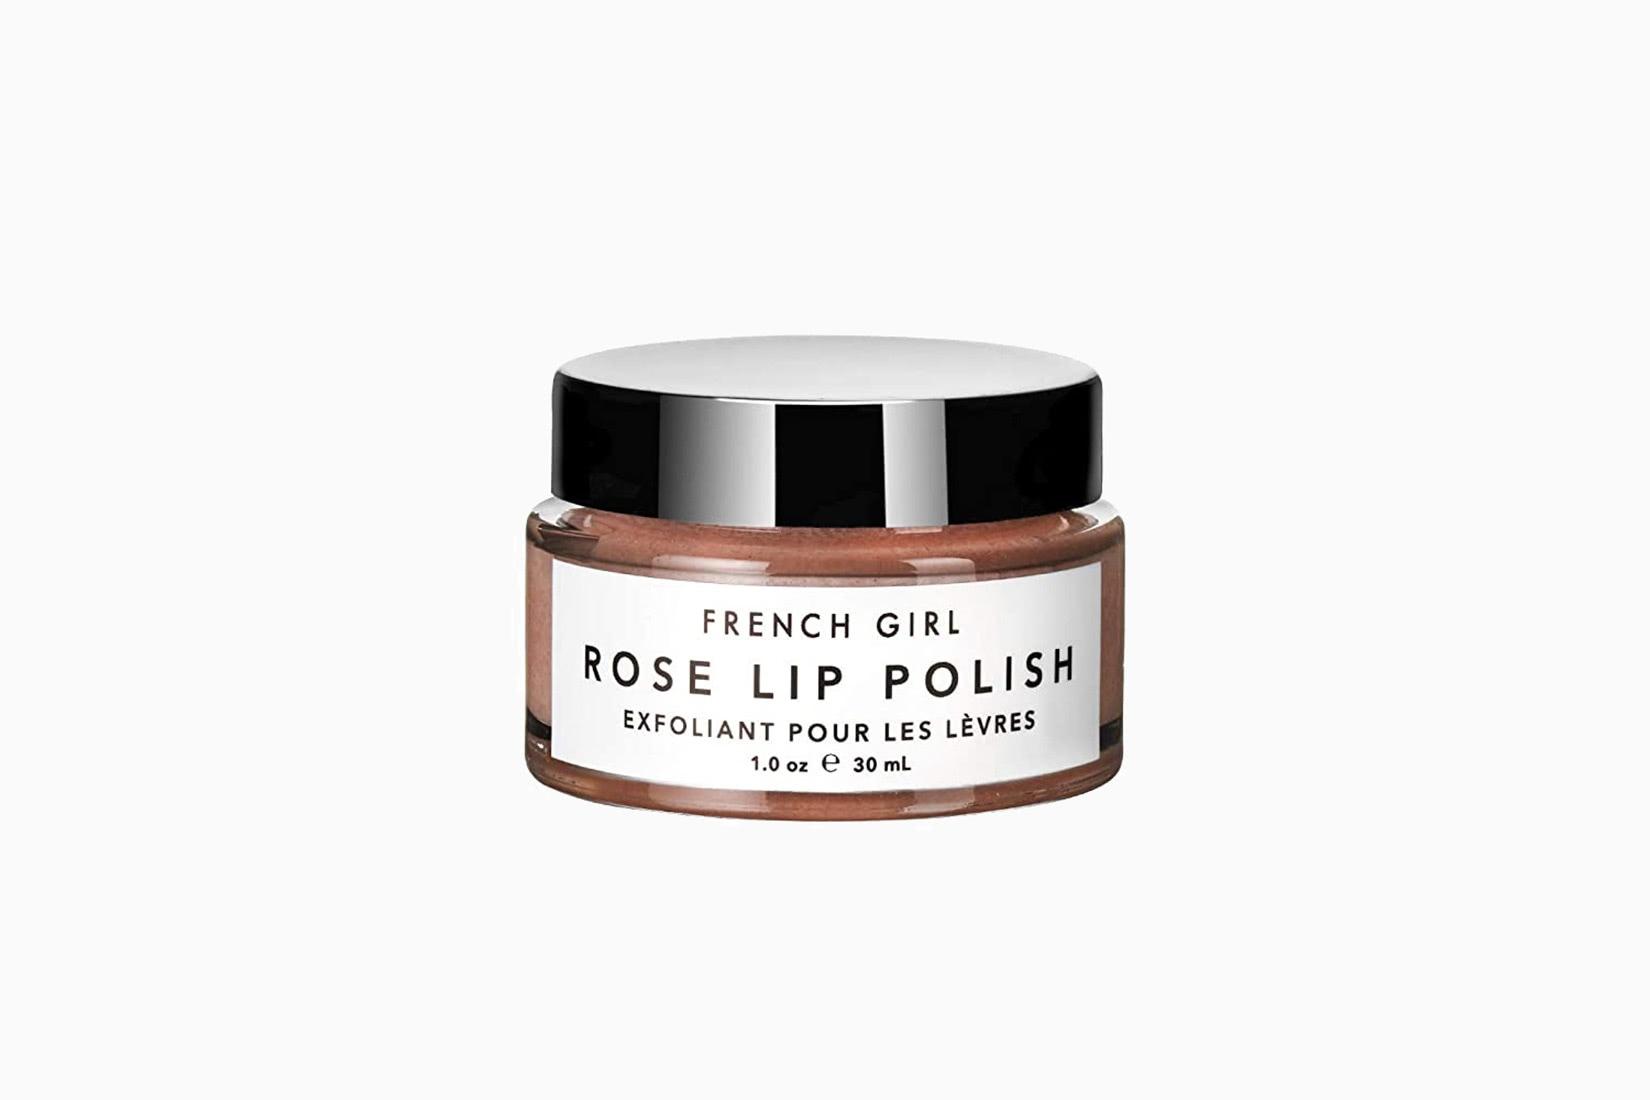 best natural organic beauty skincare french girl organics rose lip polish - Luxe Digital